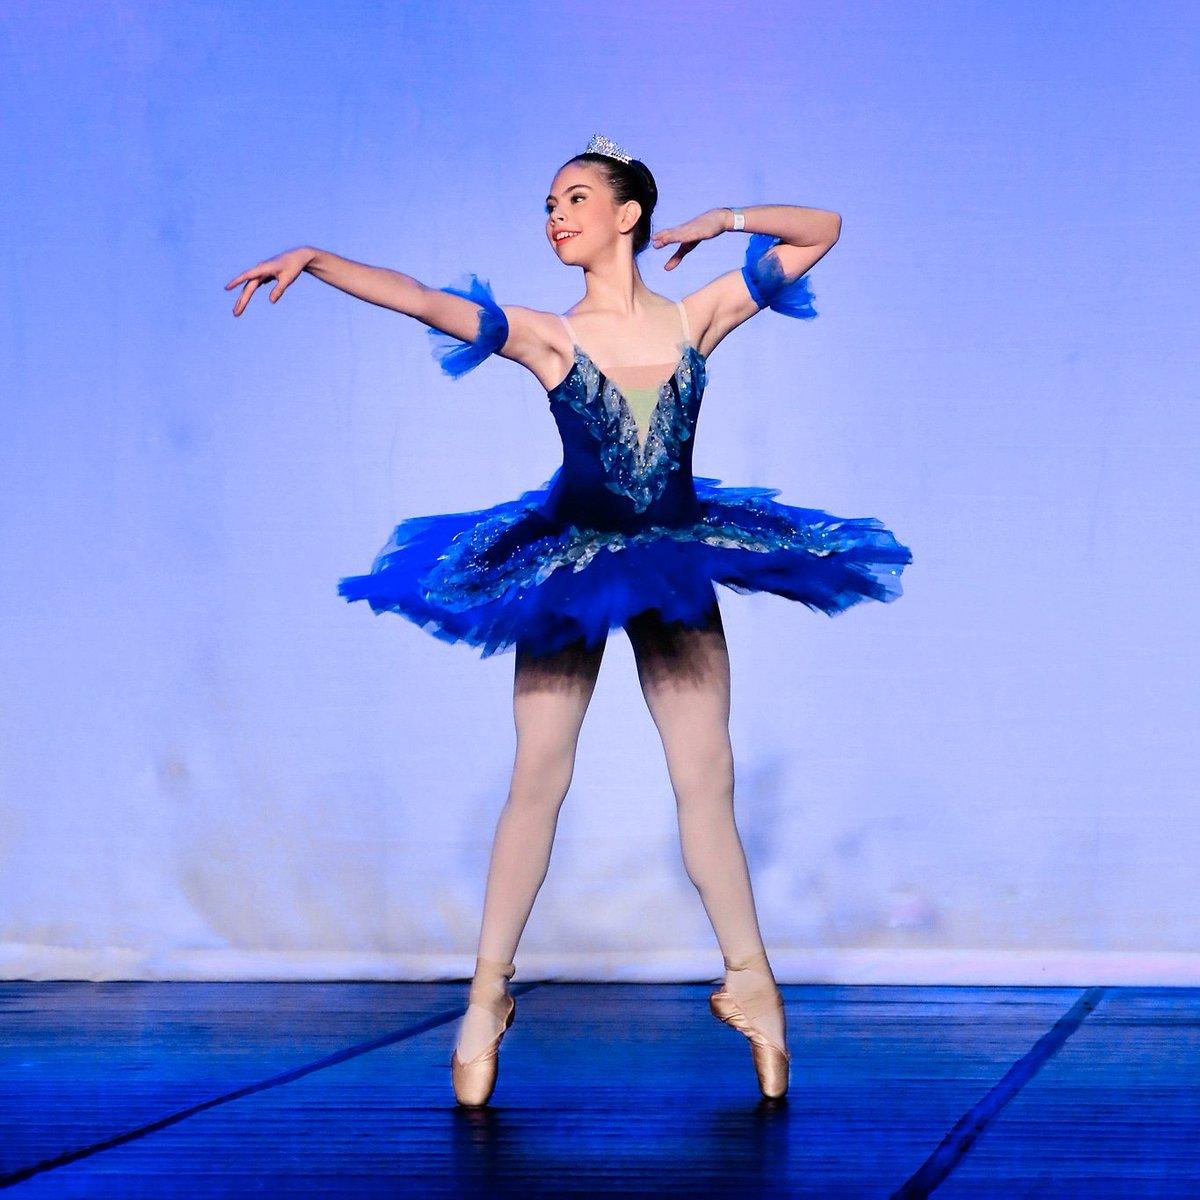 Princesa Florine 👸🏻🌺✨«Luciana Cáceres»  #バレエ #балет #Ballet #dance #Paraguay @SrRobsonmaia @balletrobsonmai